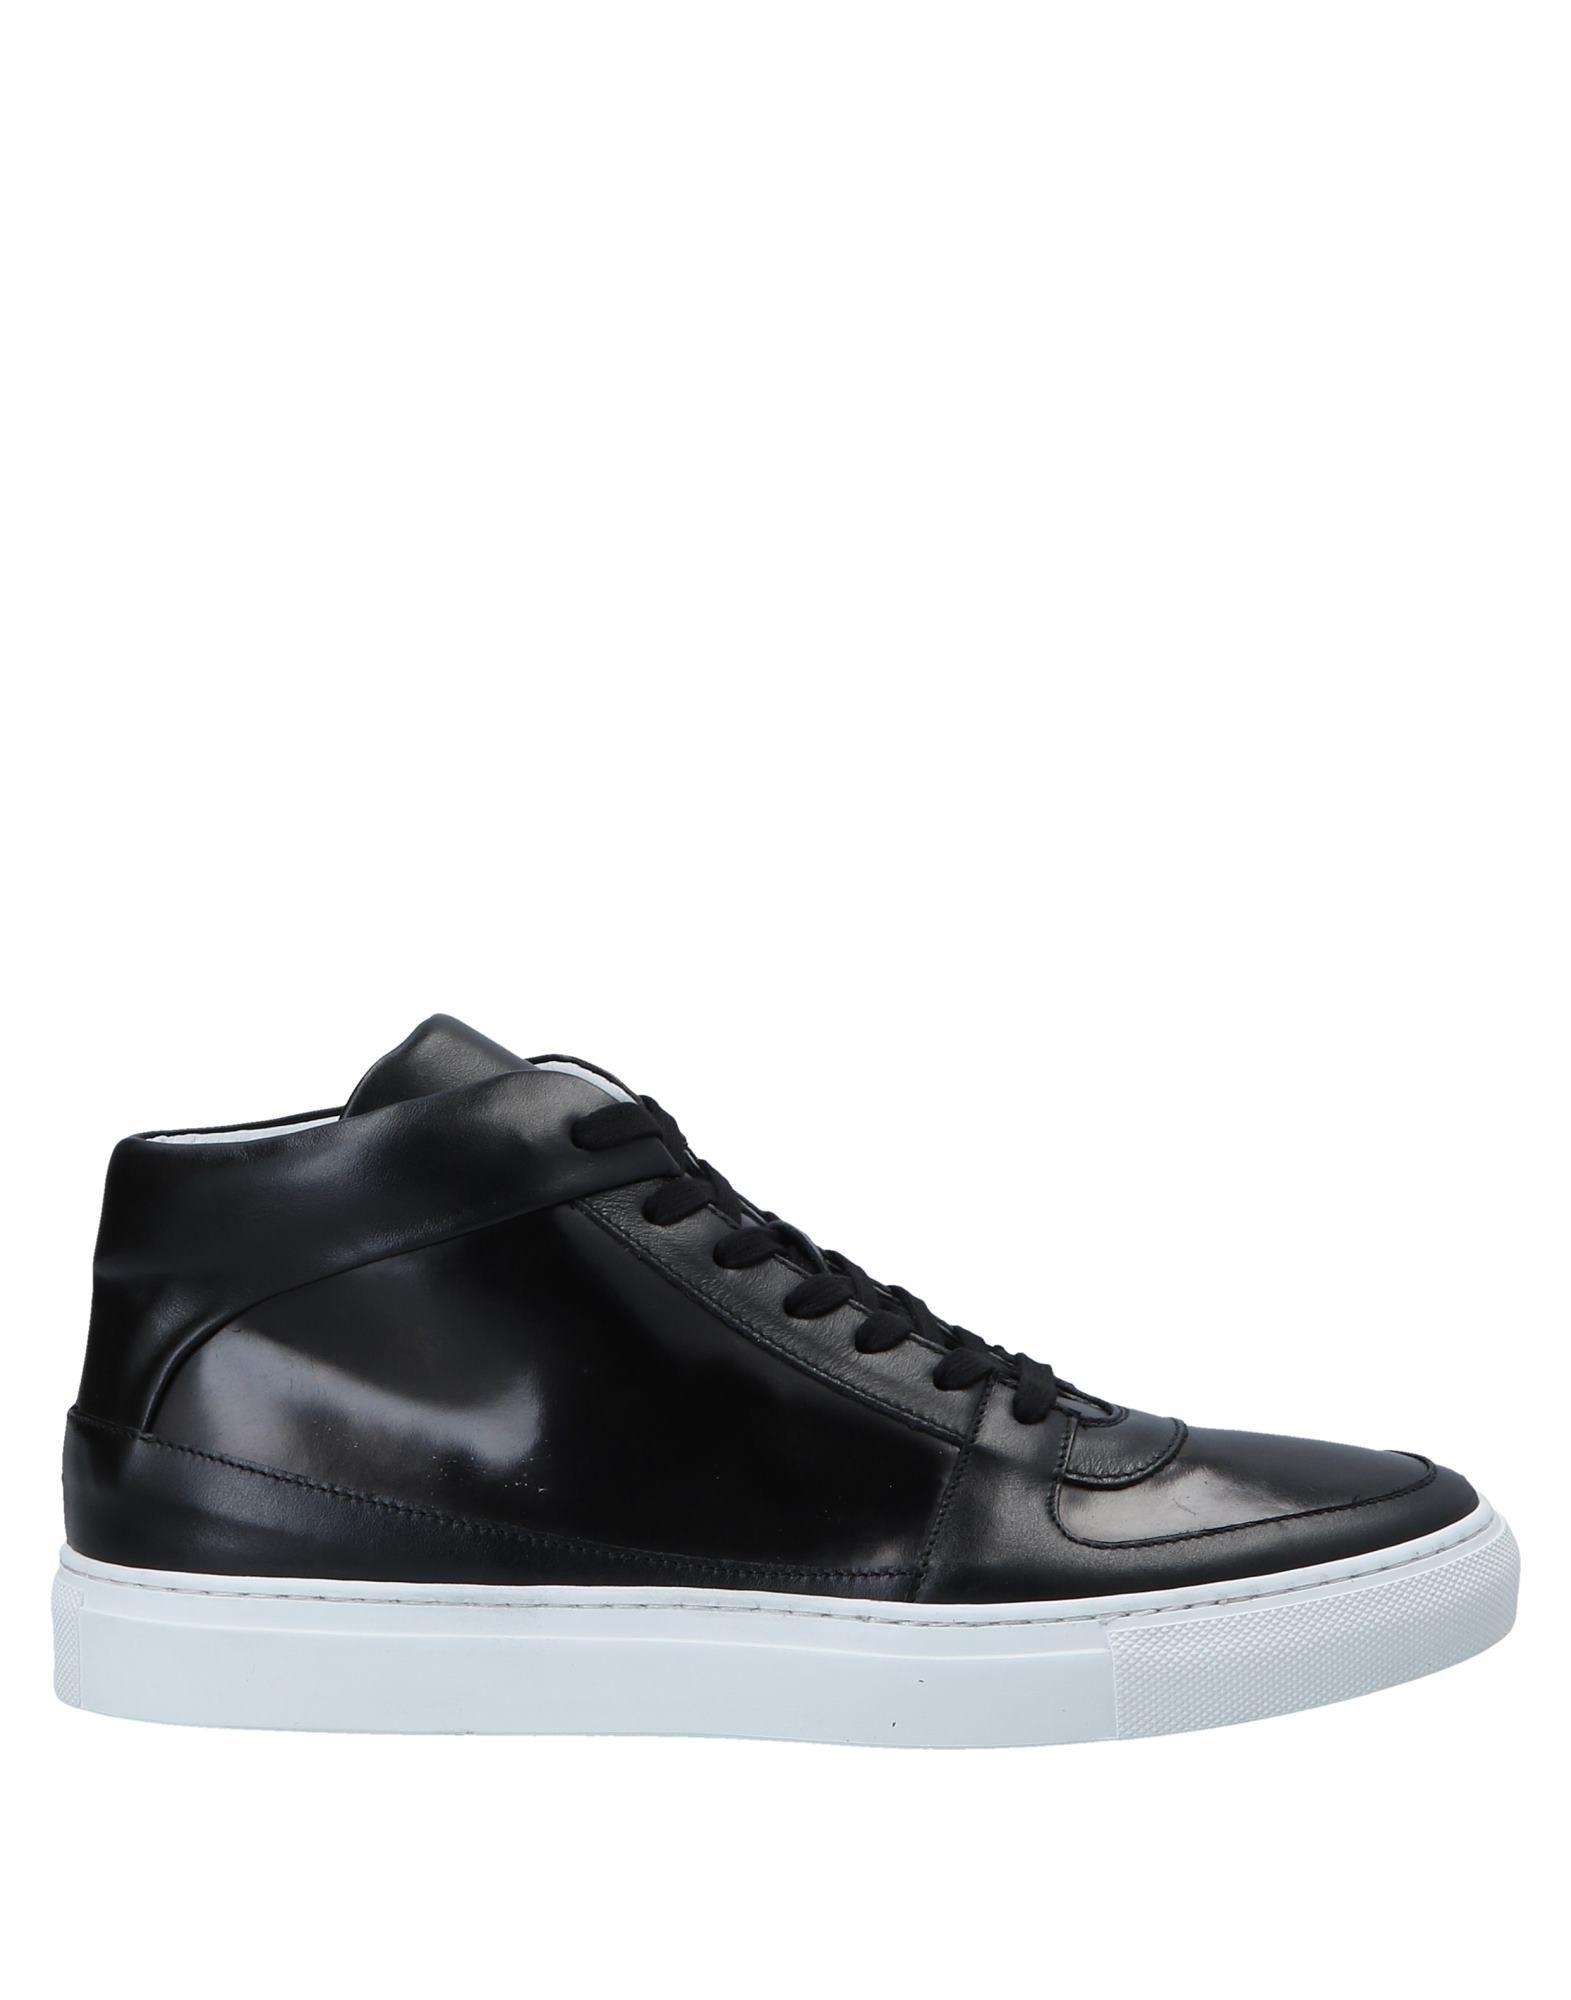 Fabiano 11548488UO Ricci Sneakers Herren  11548488UO Fabiano Gute Qualität beliebte Schuhe 3bedae